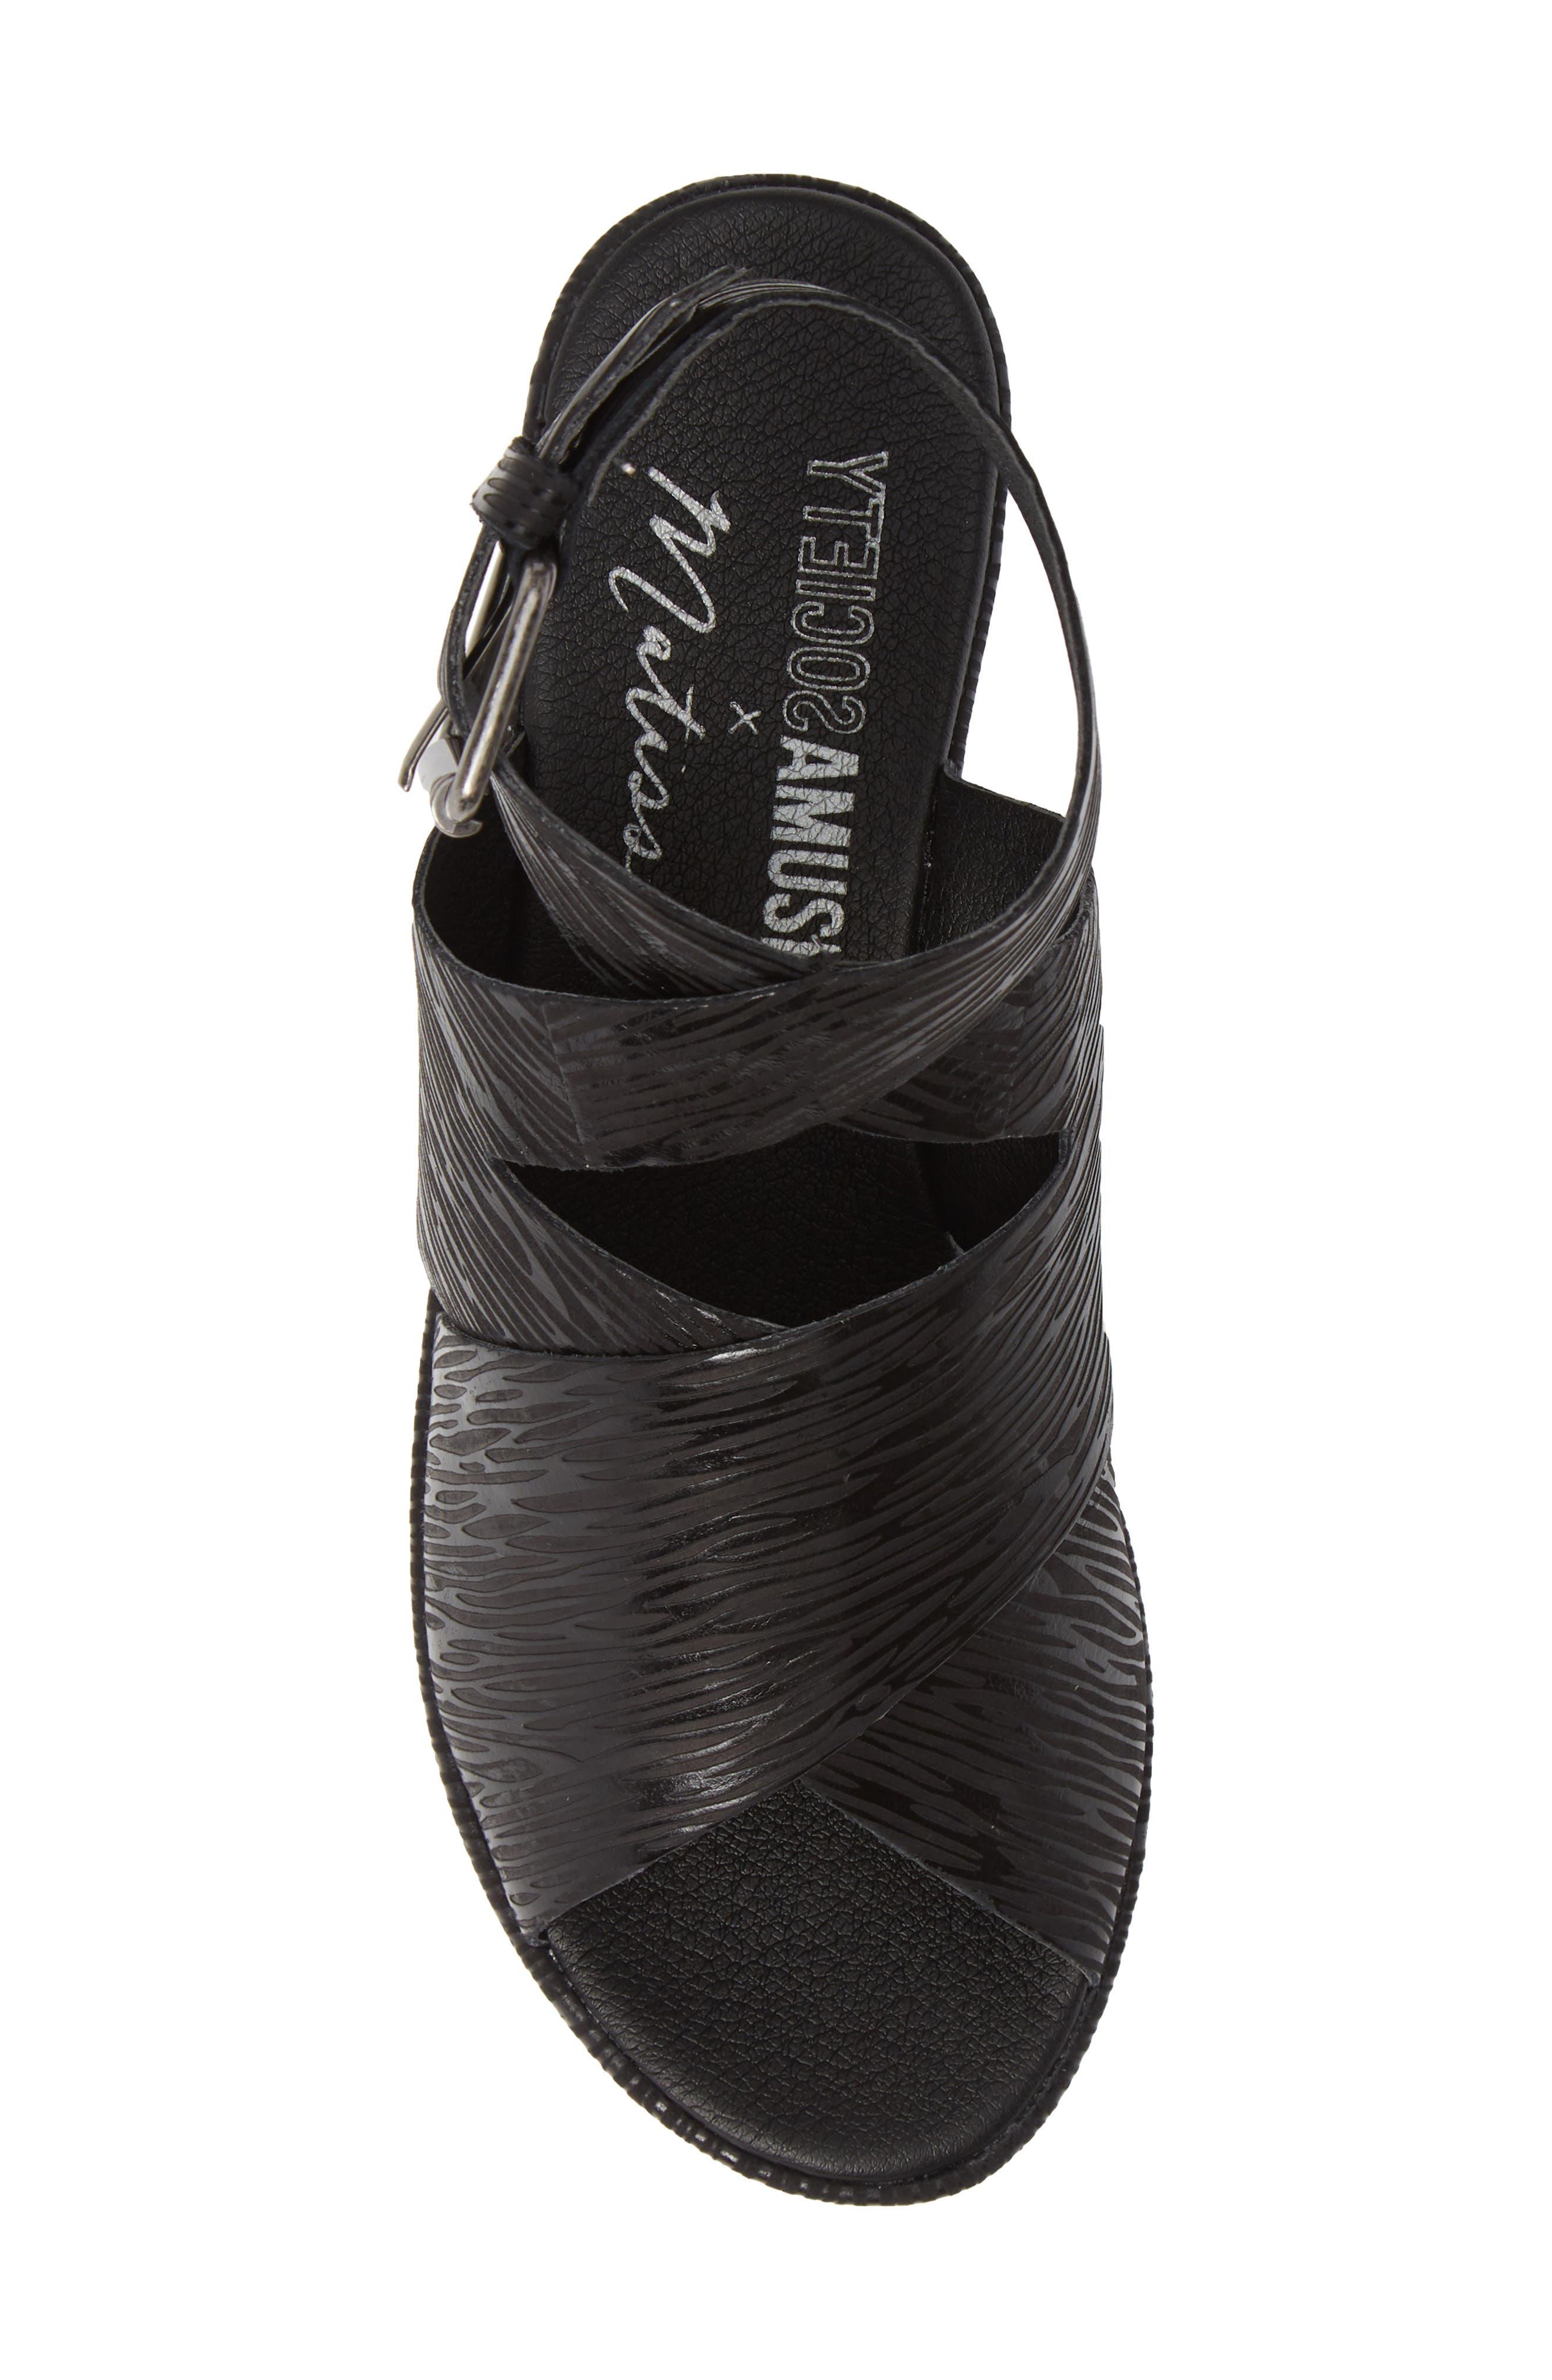 Runway Wedge Sandal,                             Alternate thumbnail 5, color,                             Black Lizard Print Leather